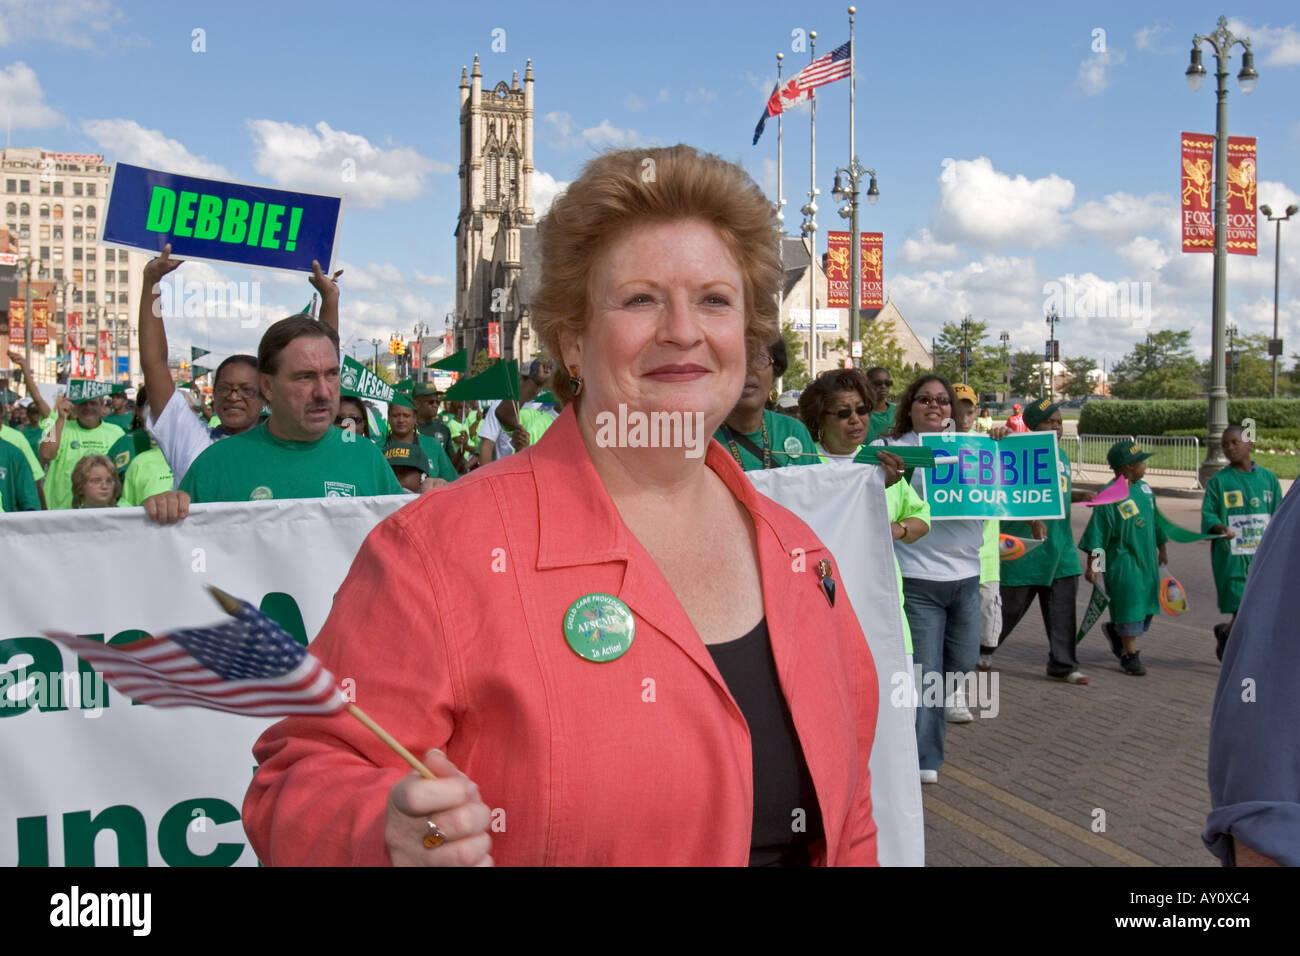 U.S. Senator Debbie Stabenow - Stock Image